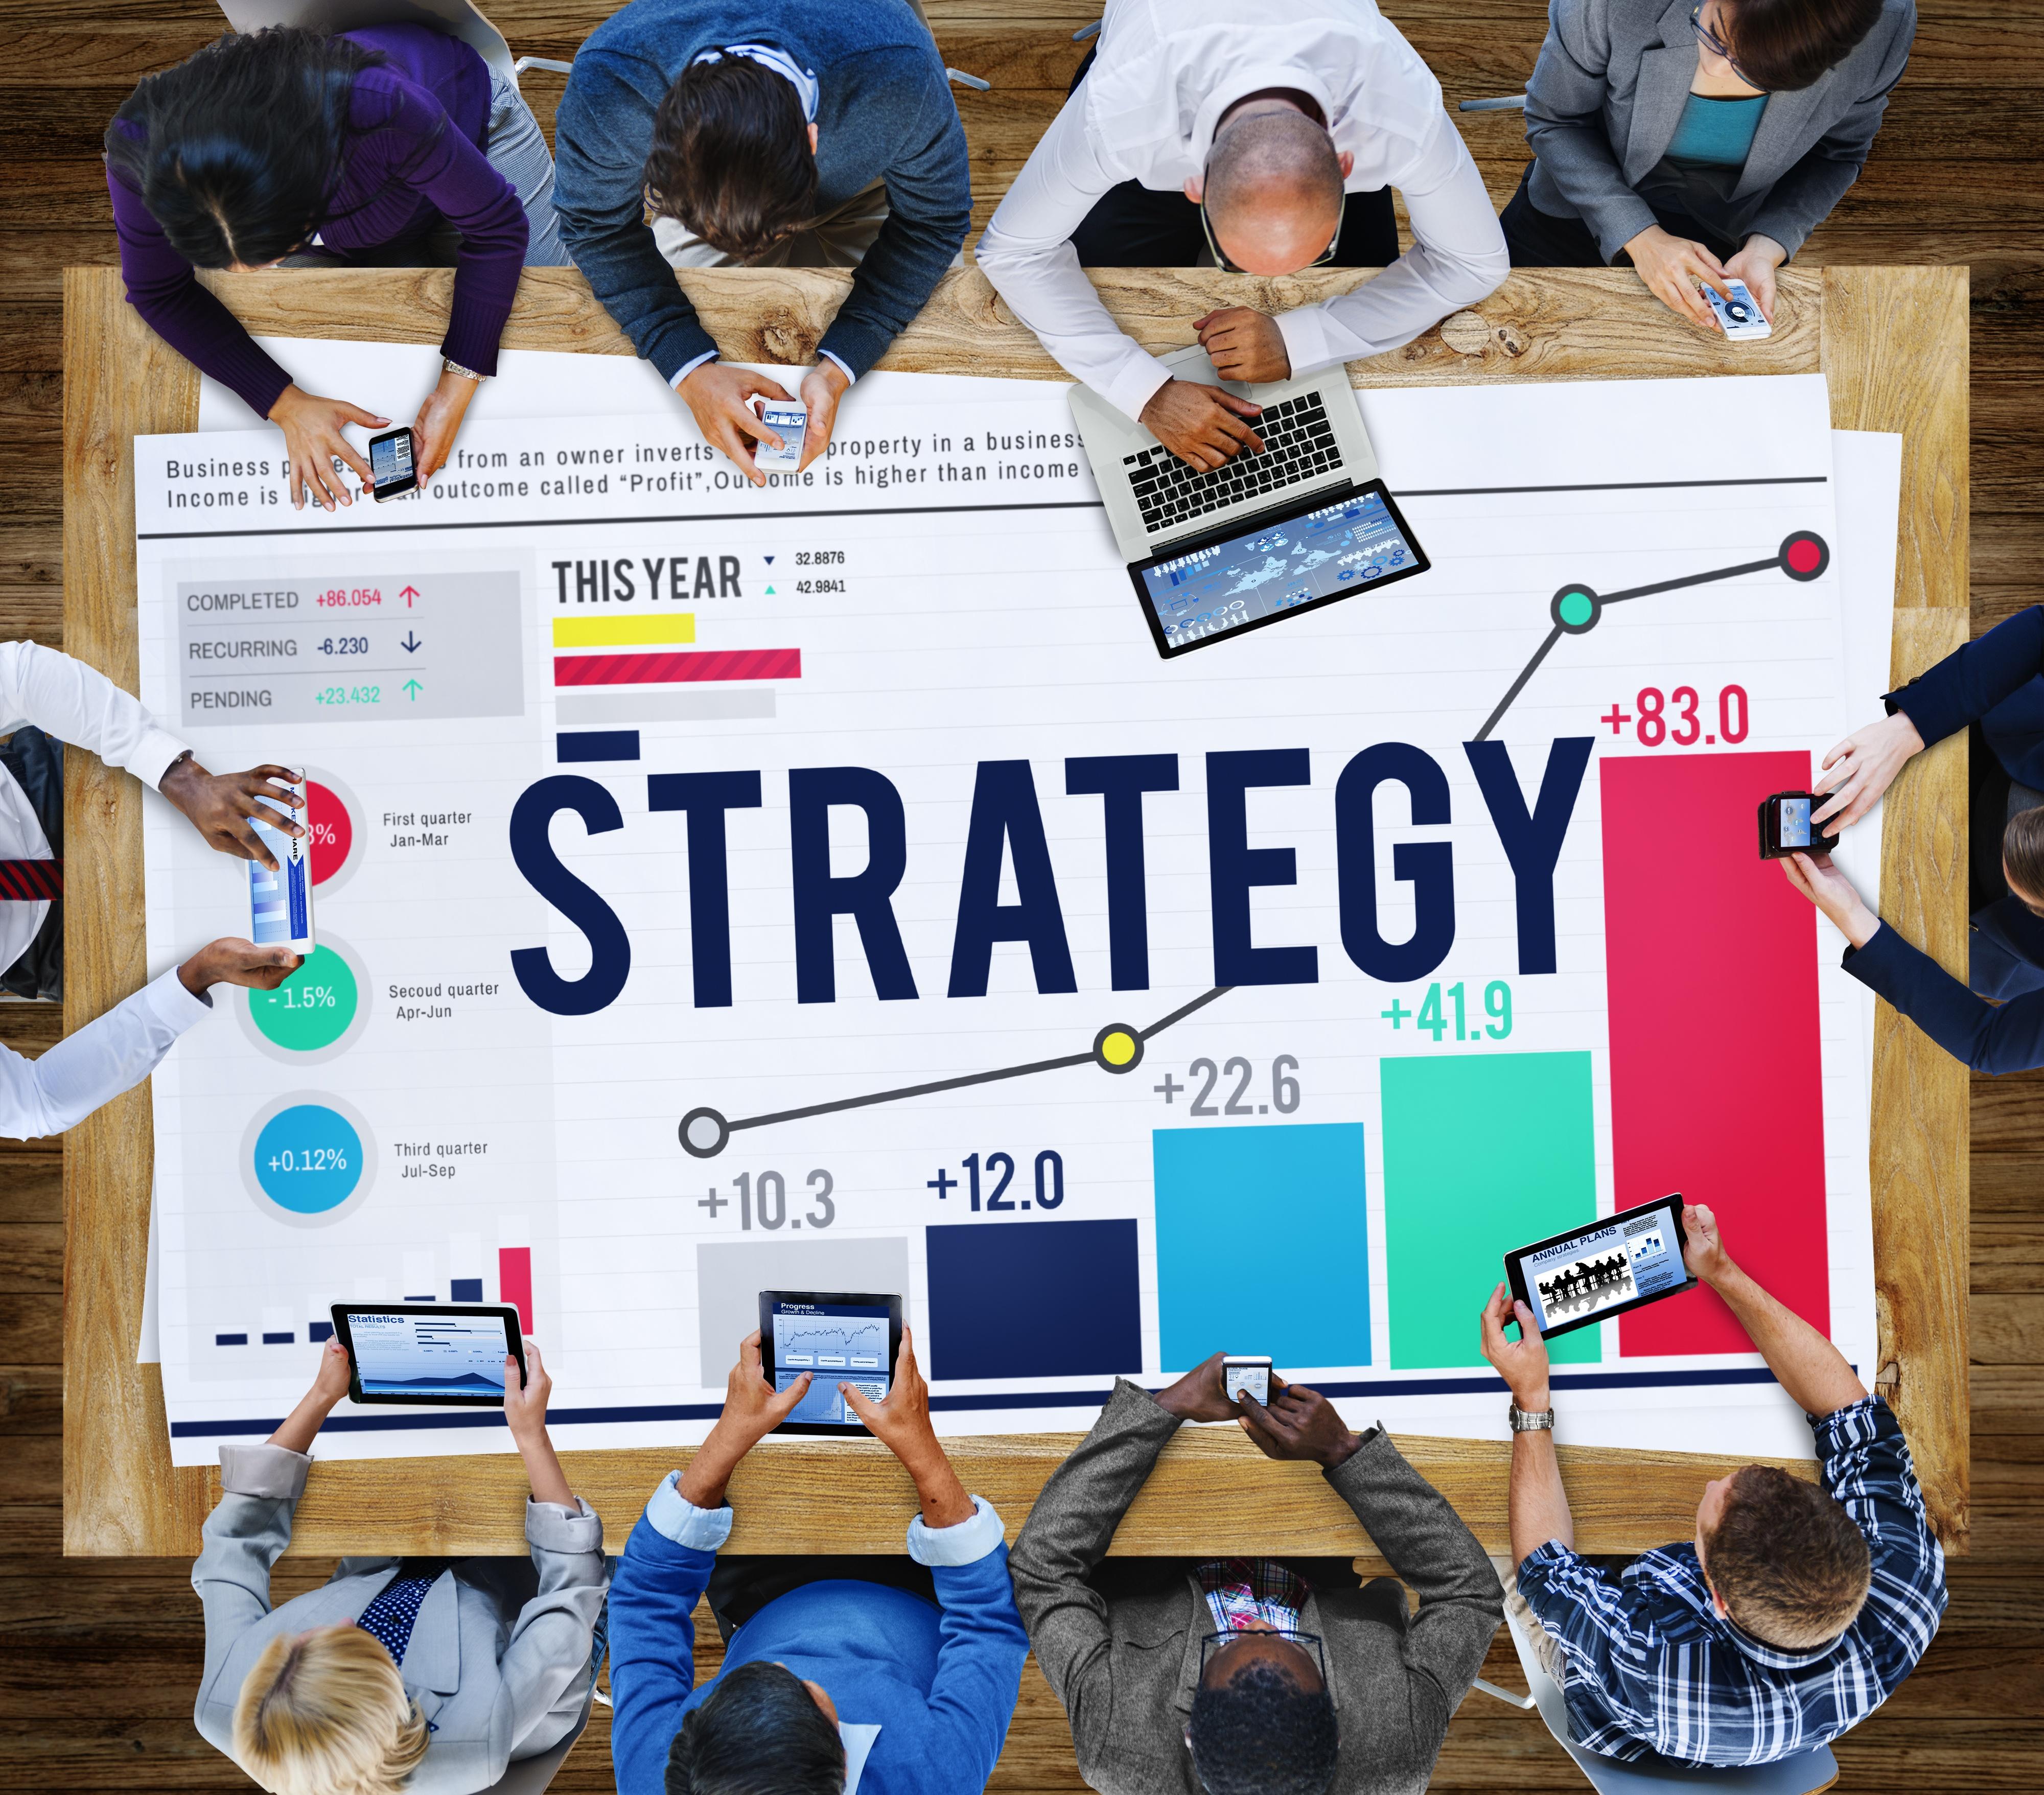 BF-System-Strategy-Image.jpg